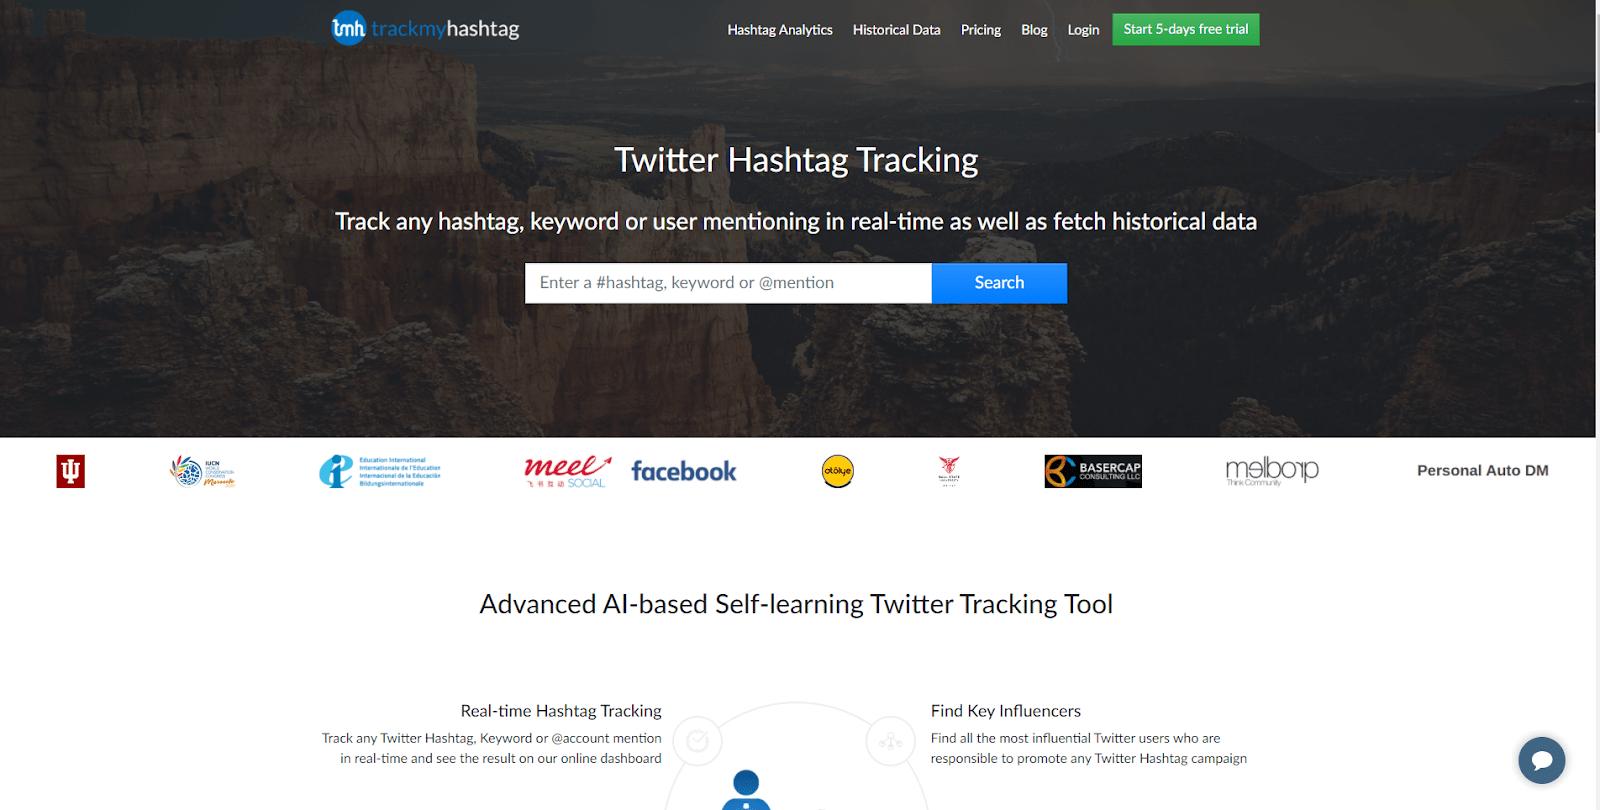 TrackMyHashtag homepage